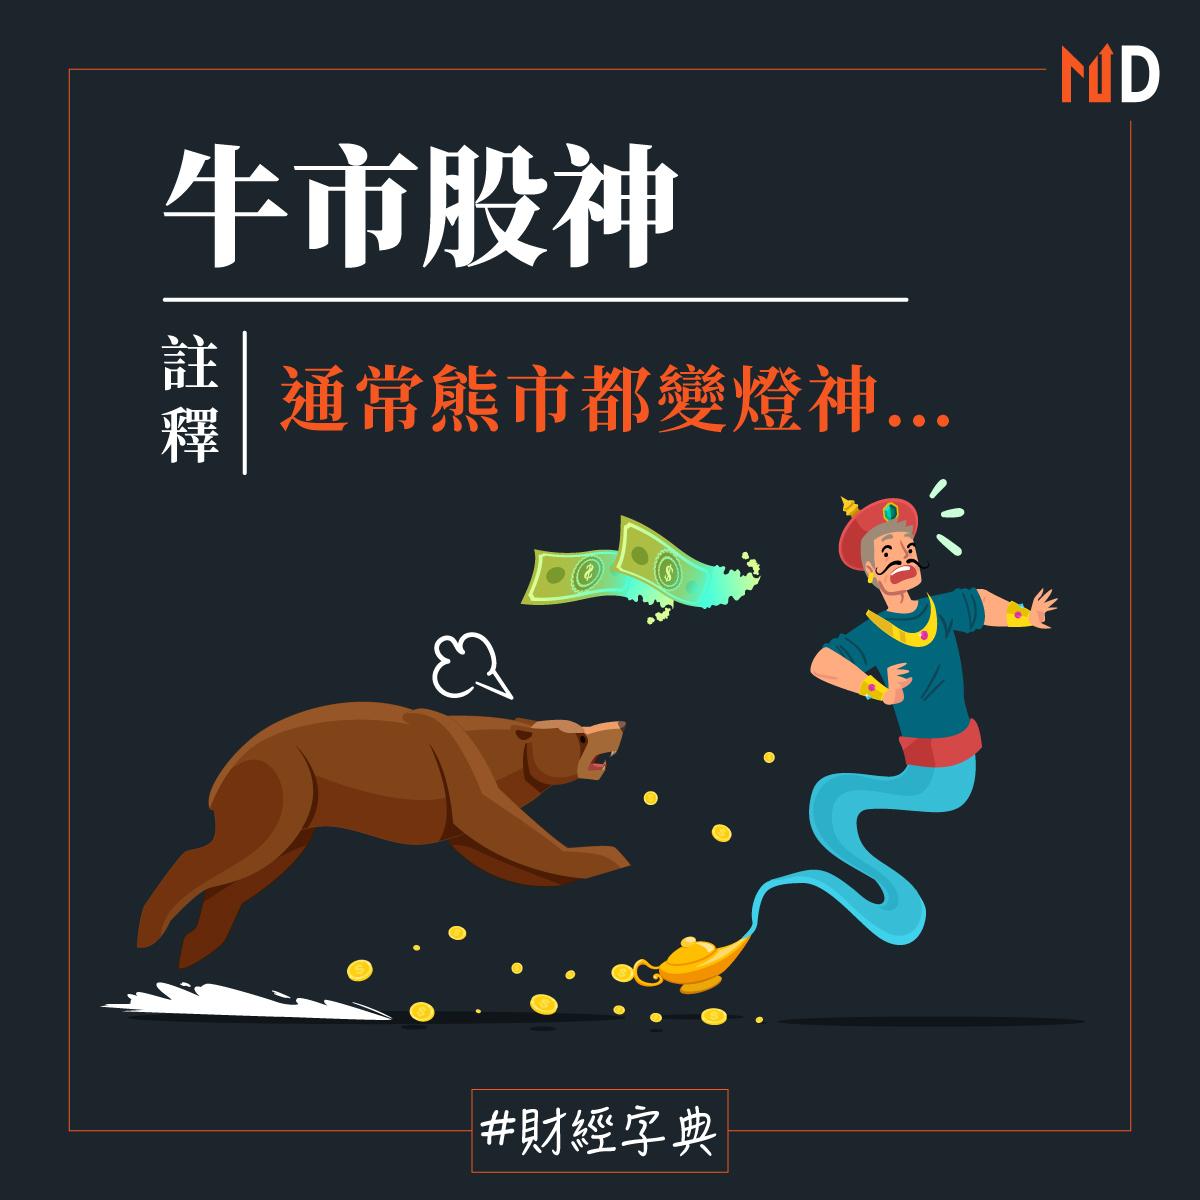 【MD財經字典】你身邊有沒有一個牛市股神(熊市燈神)?